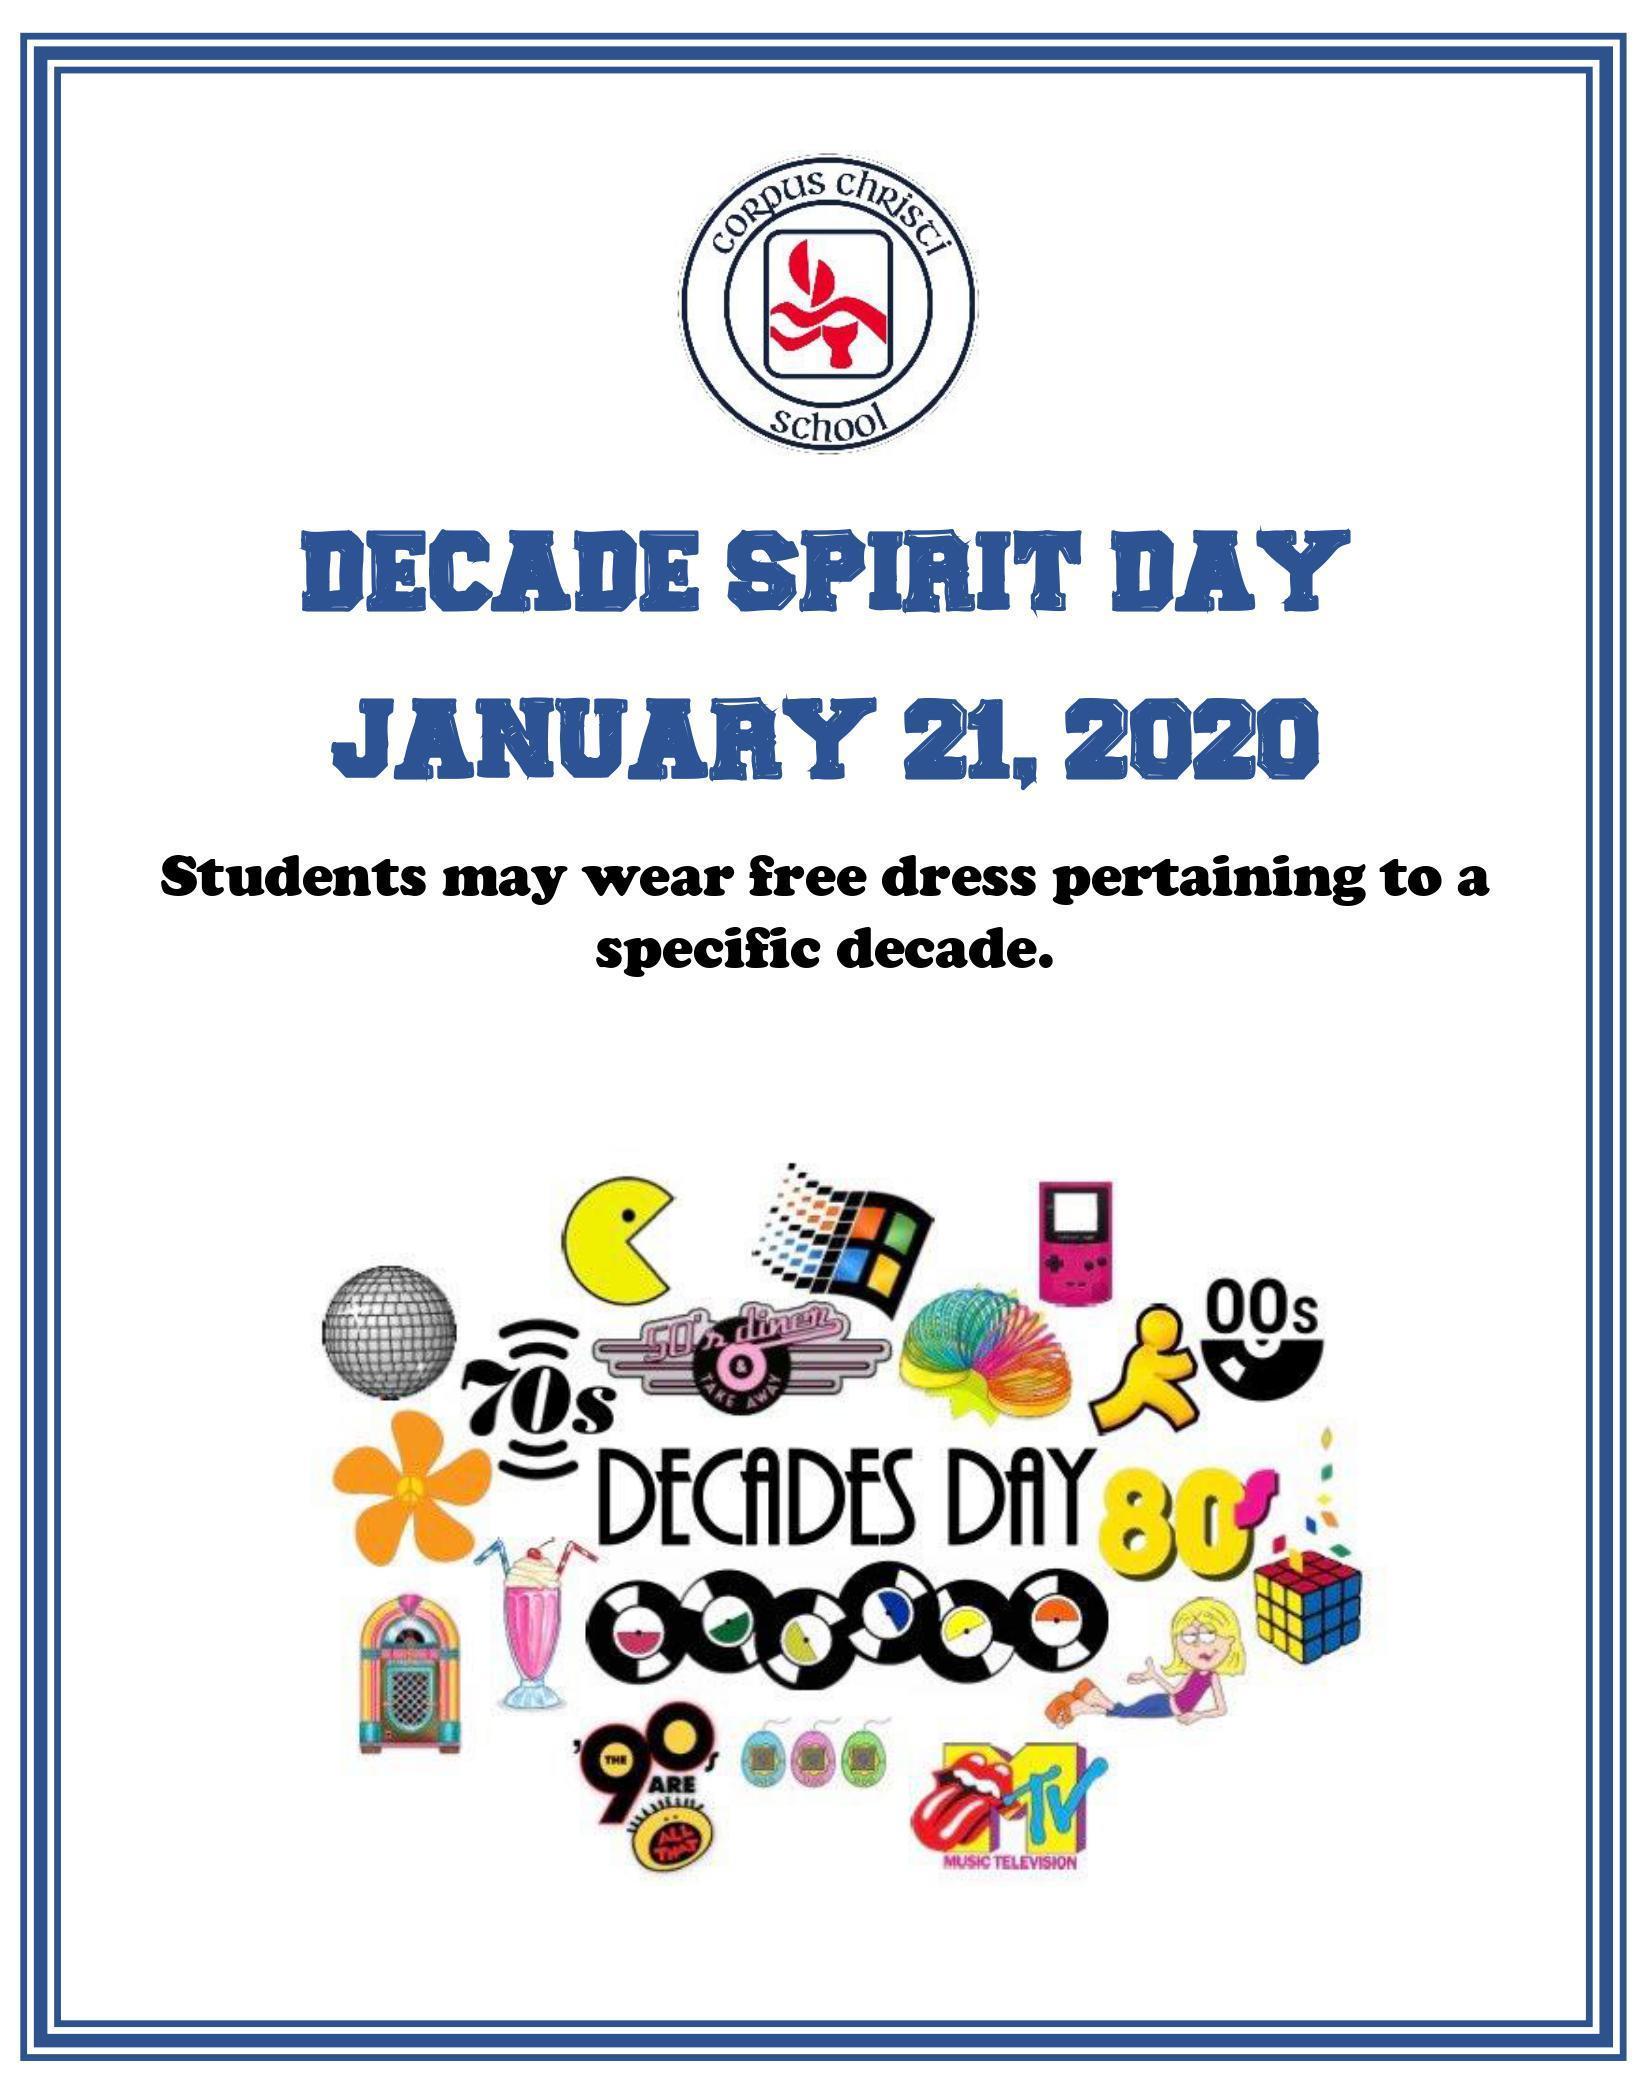 Decade Spirit Day Image